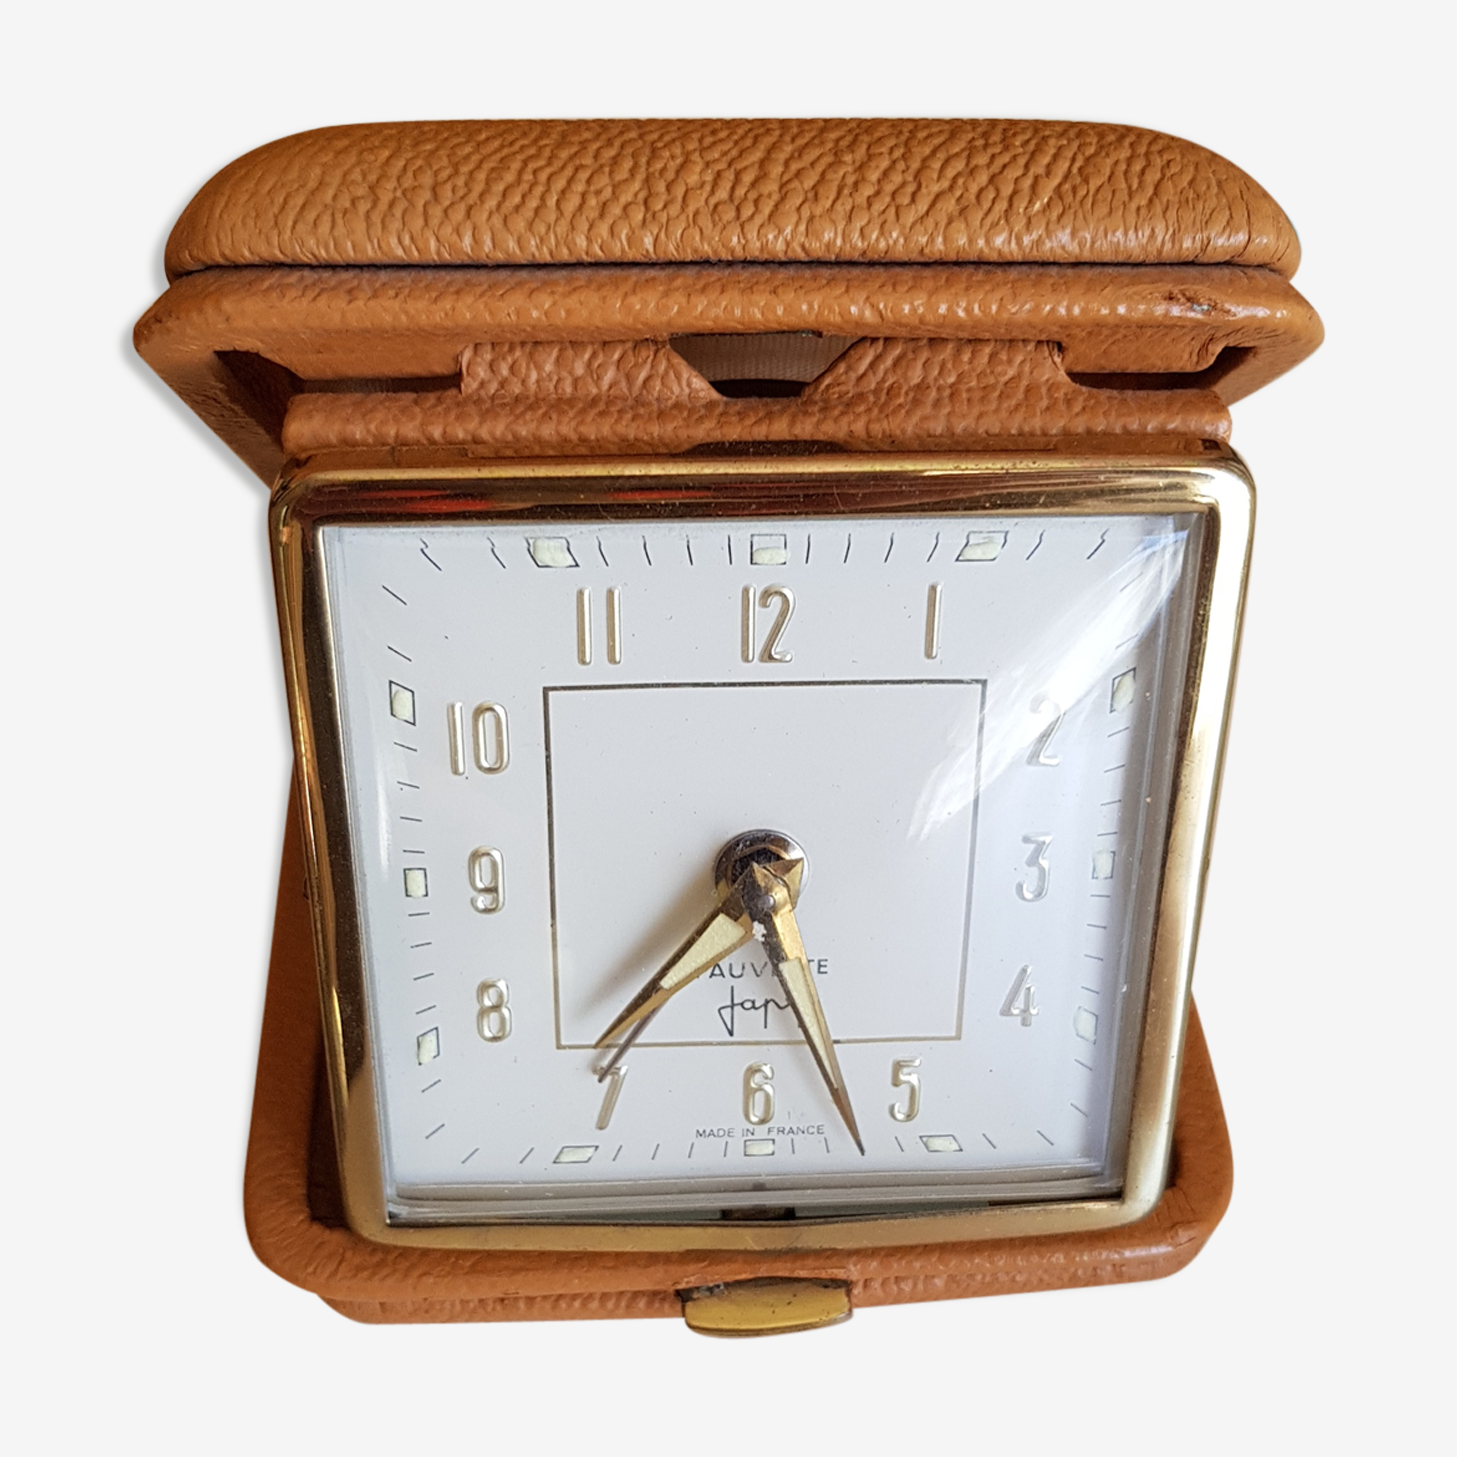 Alarm clock trip former Cadet Japy